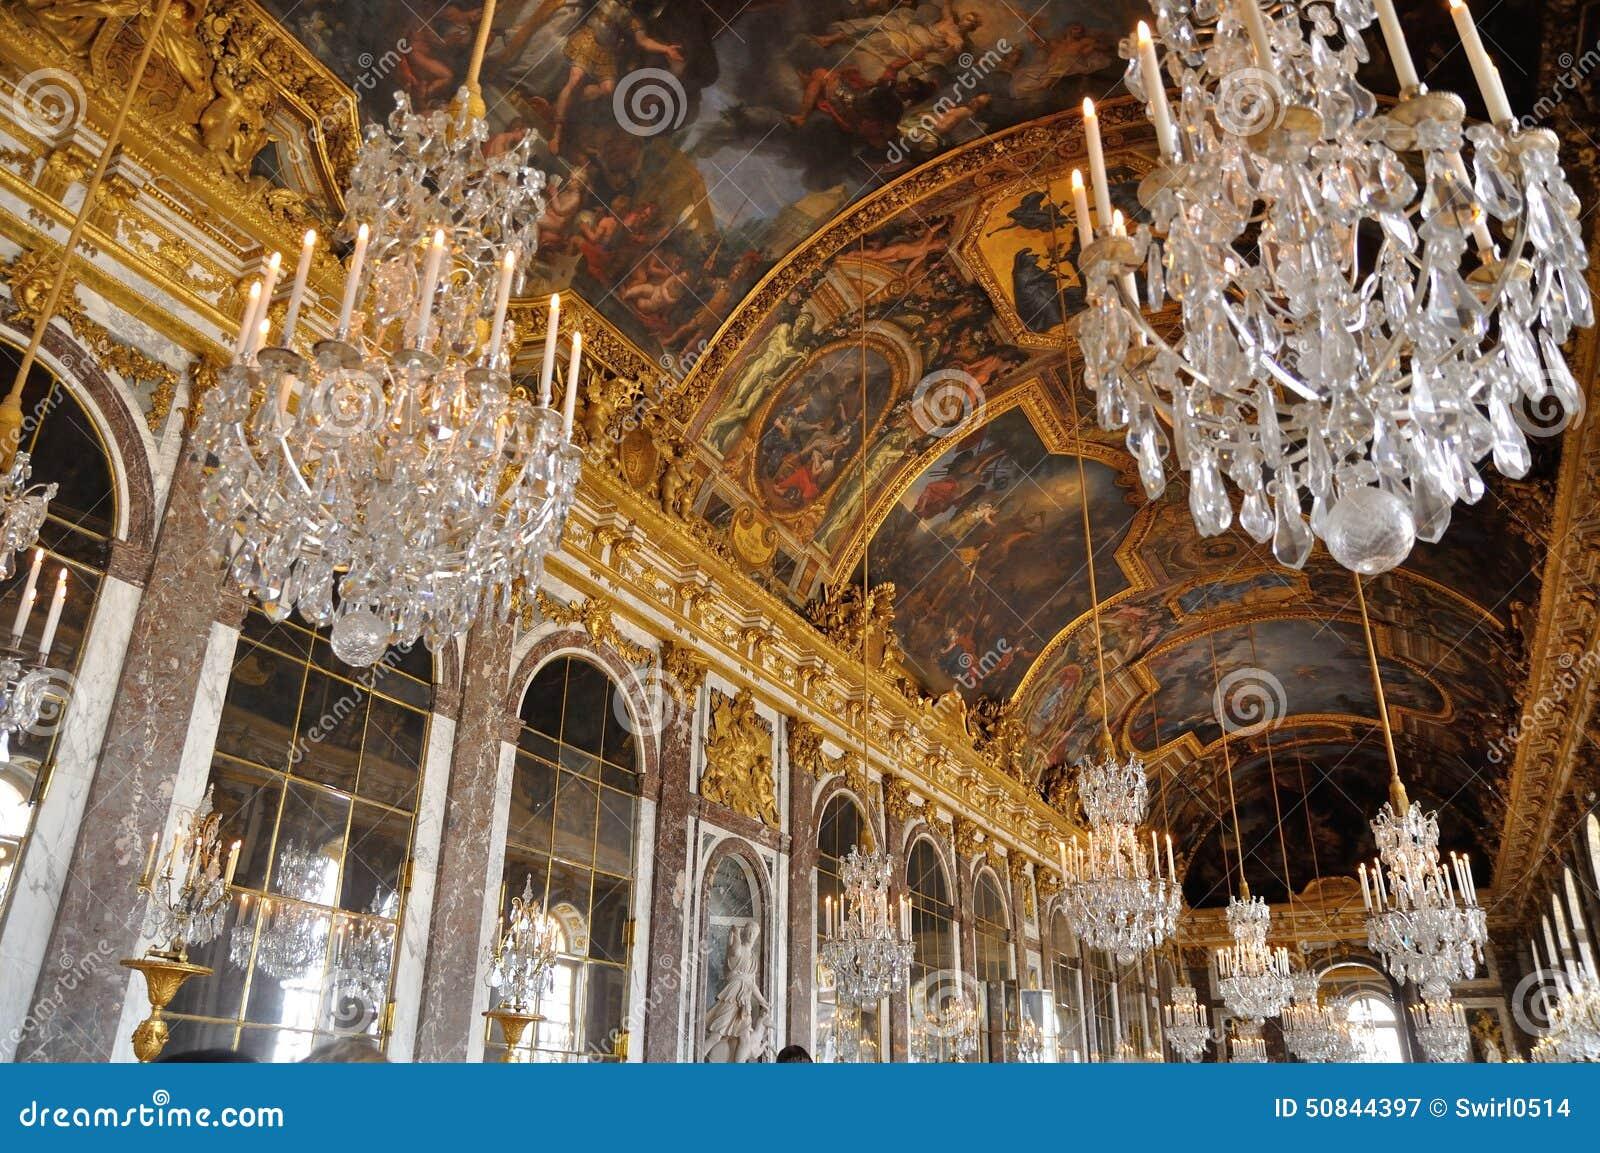 Pasillo de espejos, castillo francés de Versalles